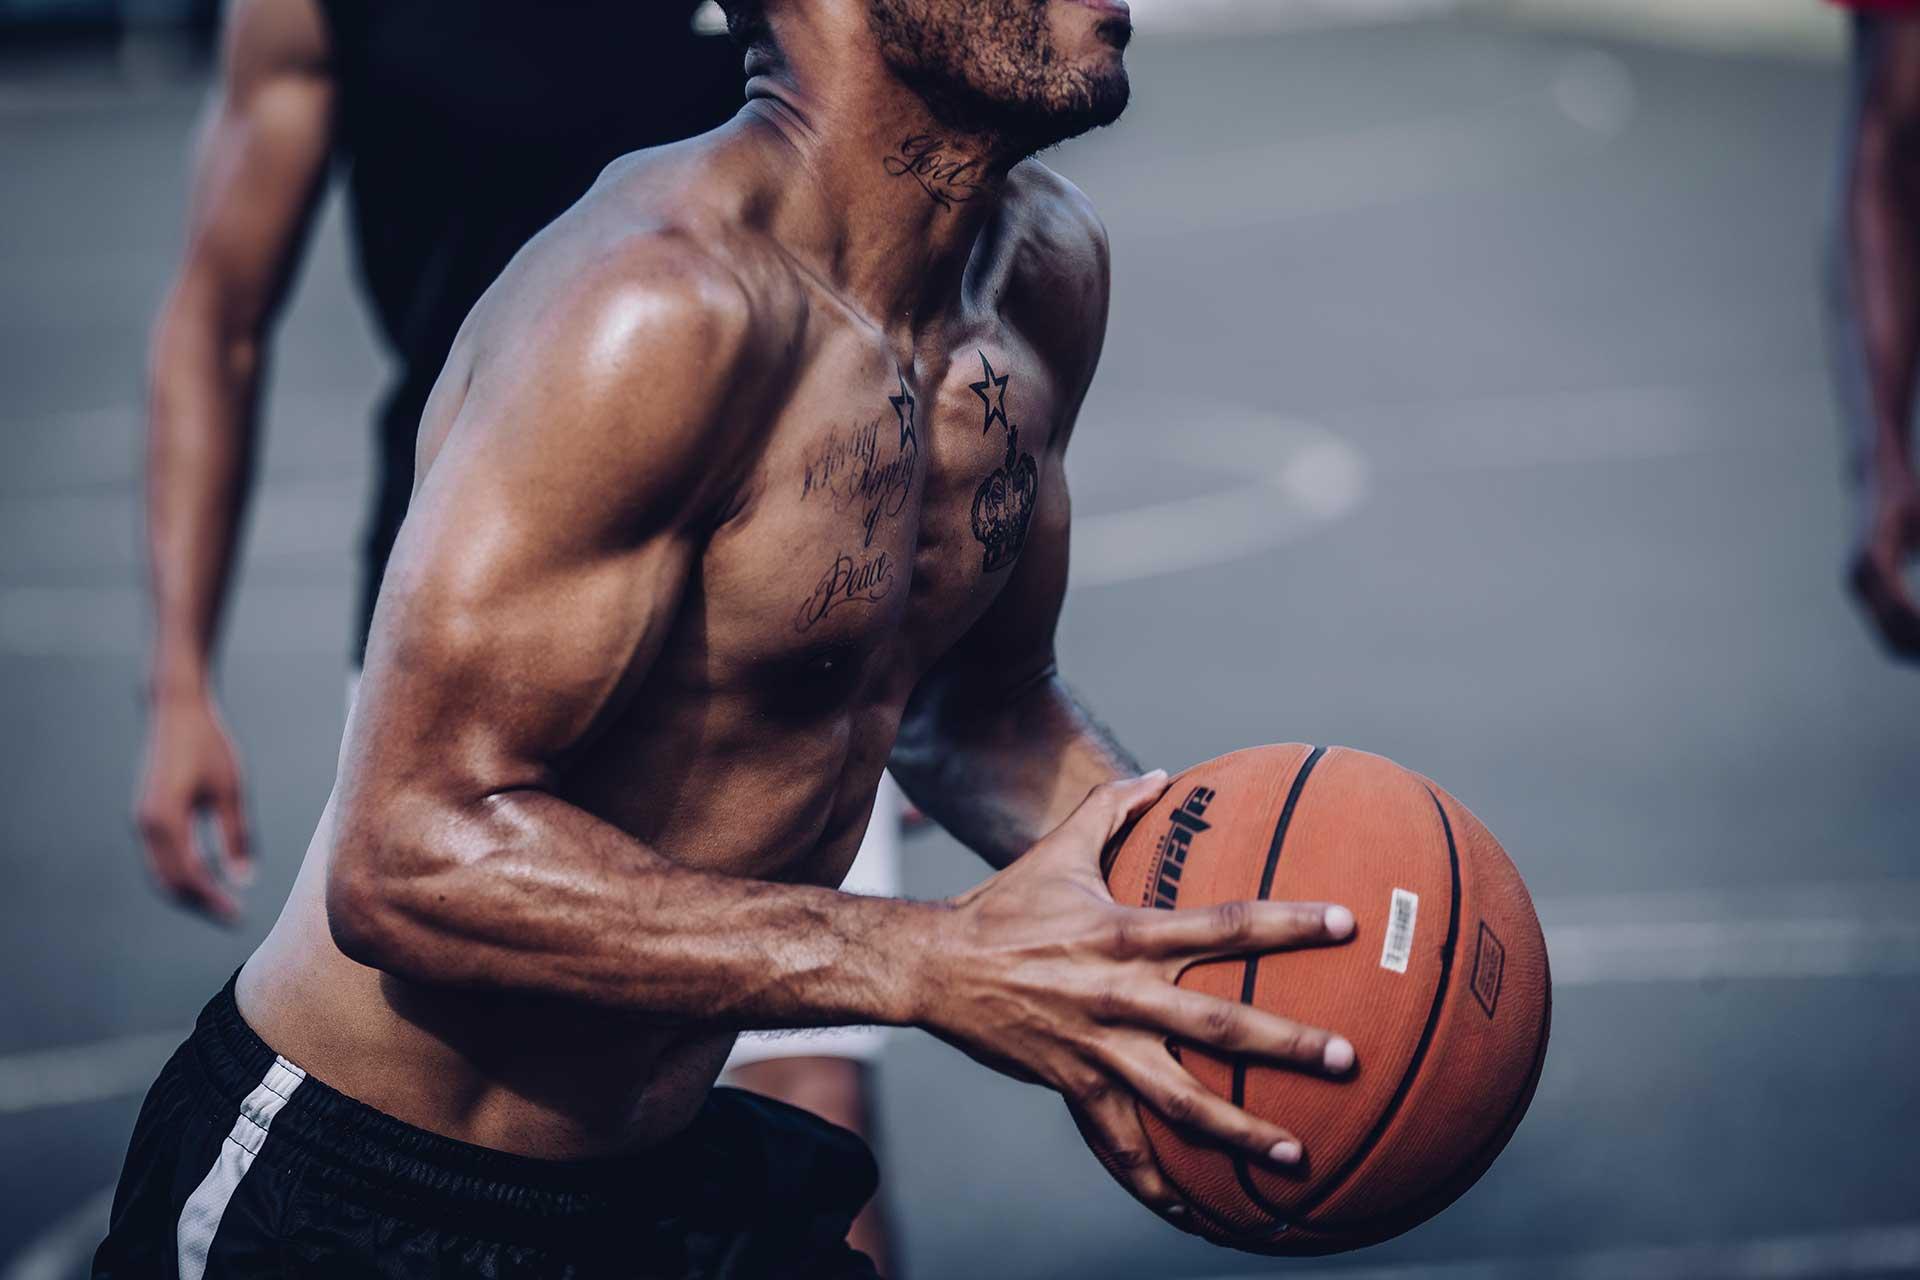 Muskeln Basketball Tattoo Sport Teamsport Michael Müller Fotograf